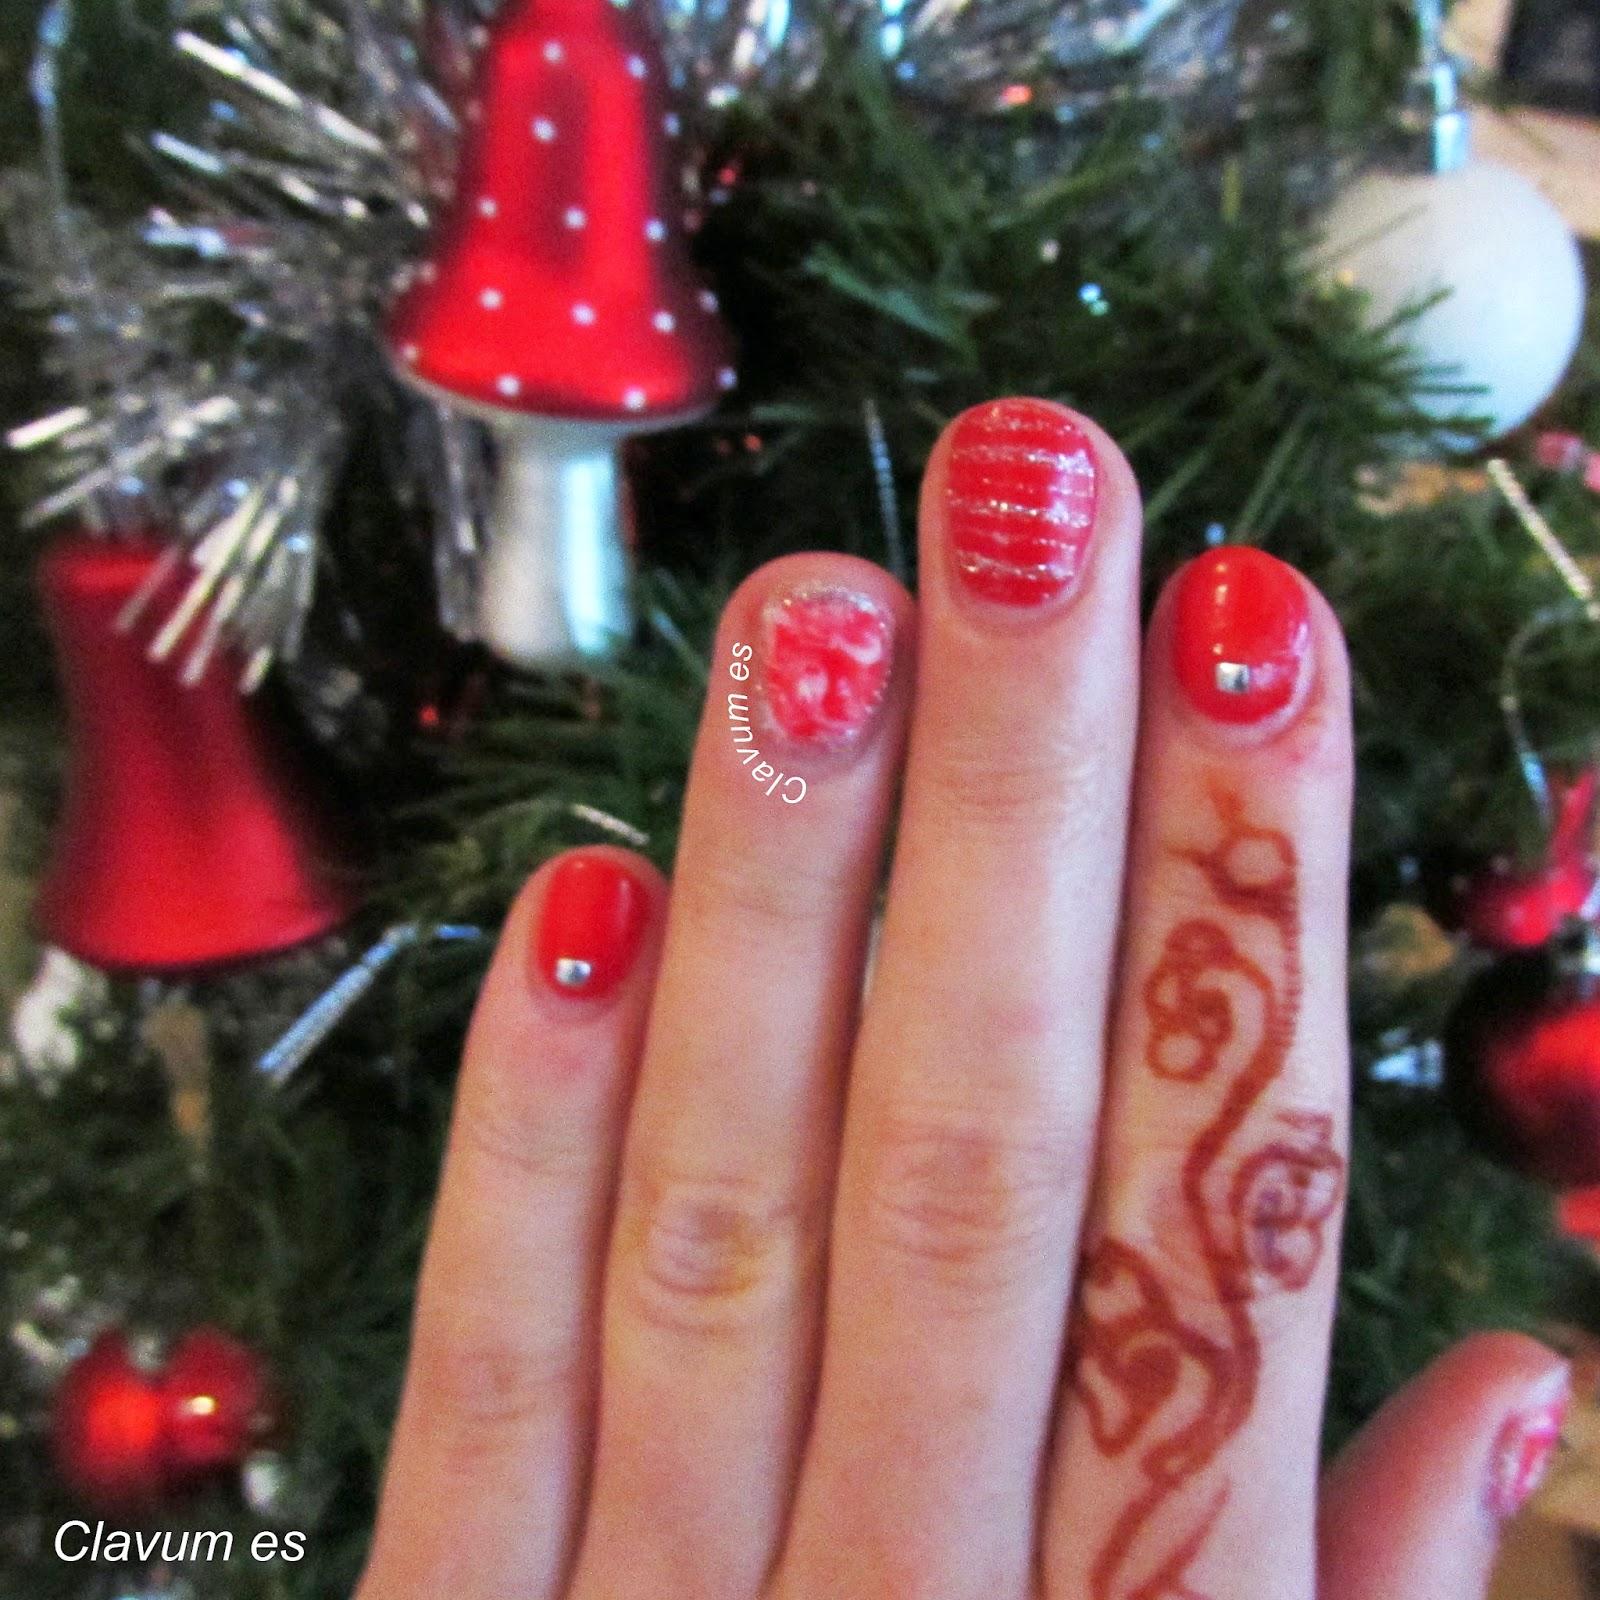 Clavum es 10 day sensationail gel polish reviewdiary gel nail art solutioingenieria Image collections